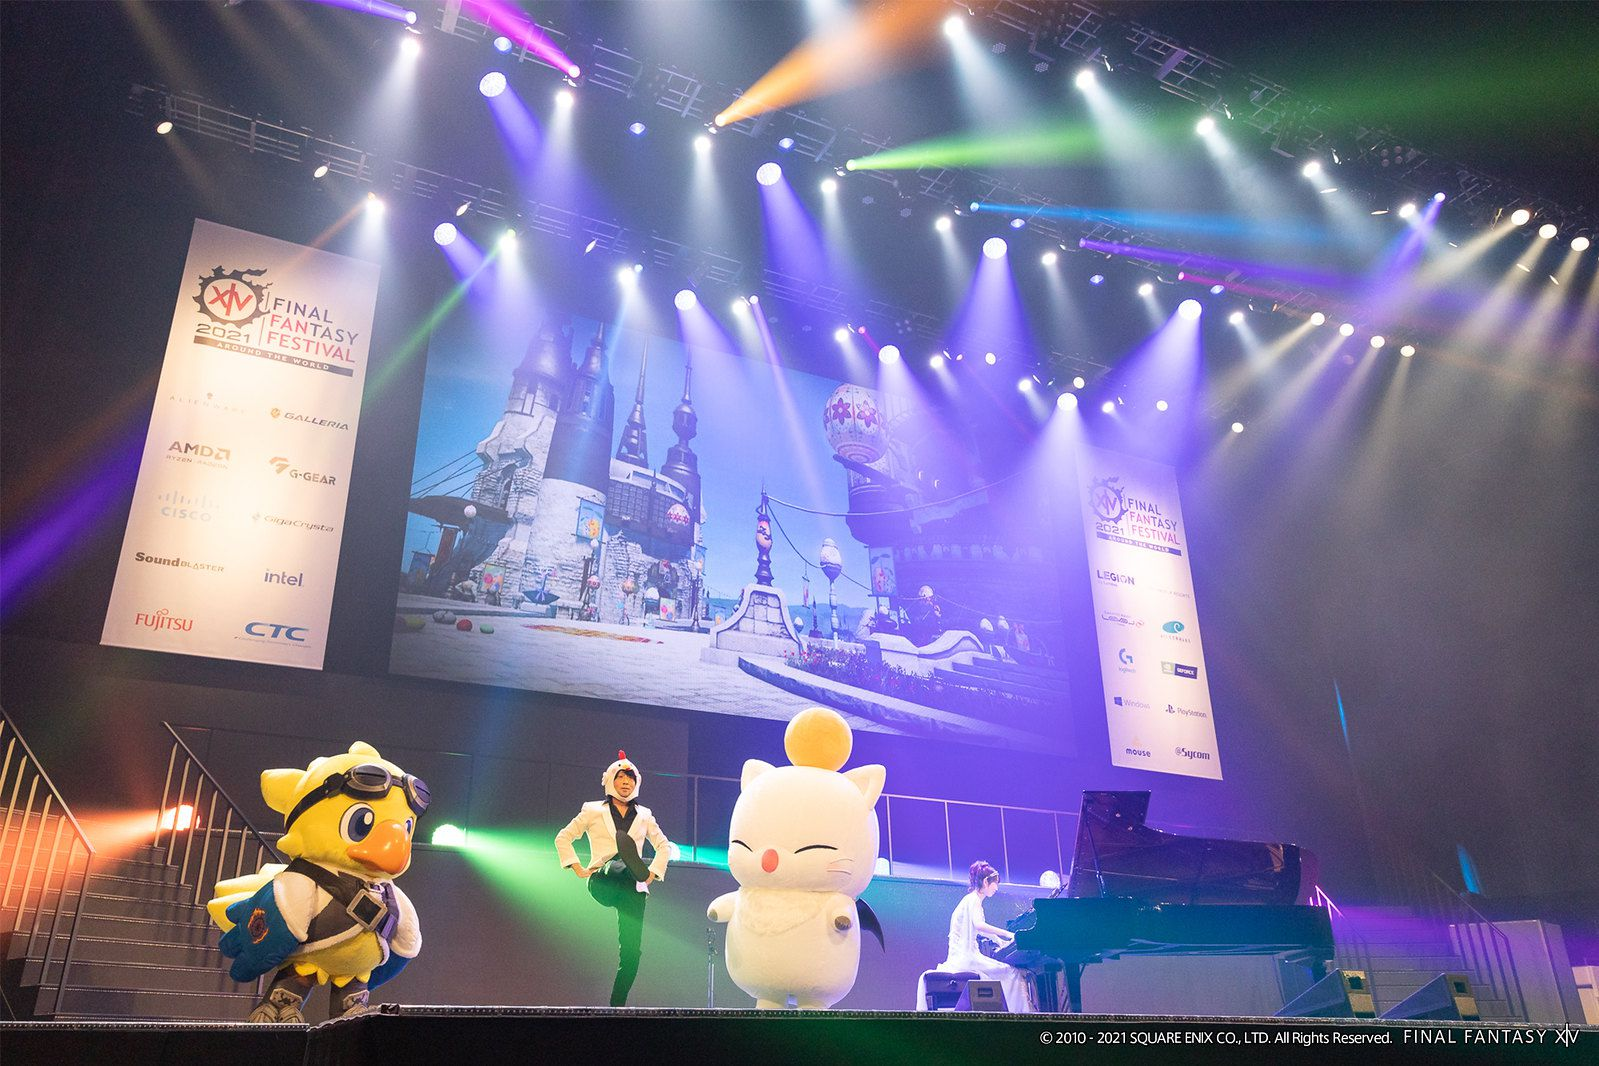 Final Fantasy XIV dépasse World of Warcraft